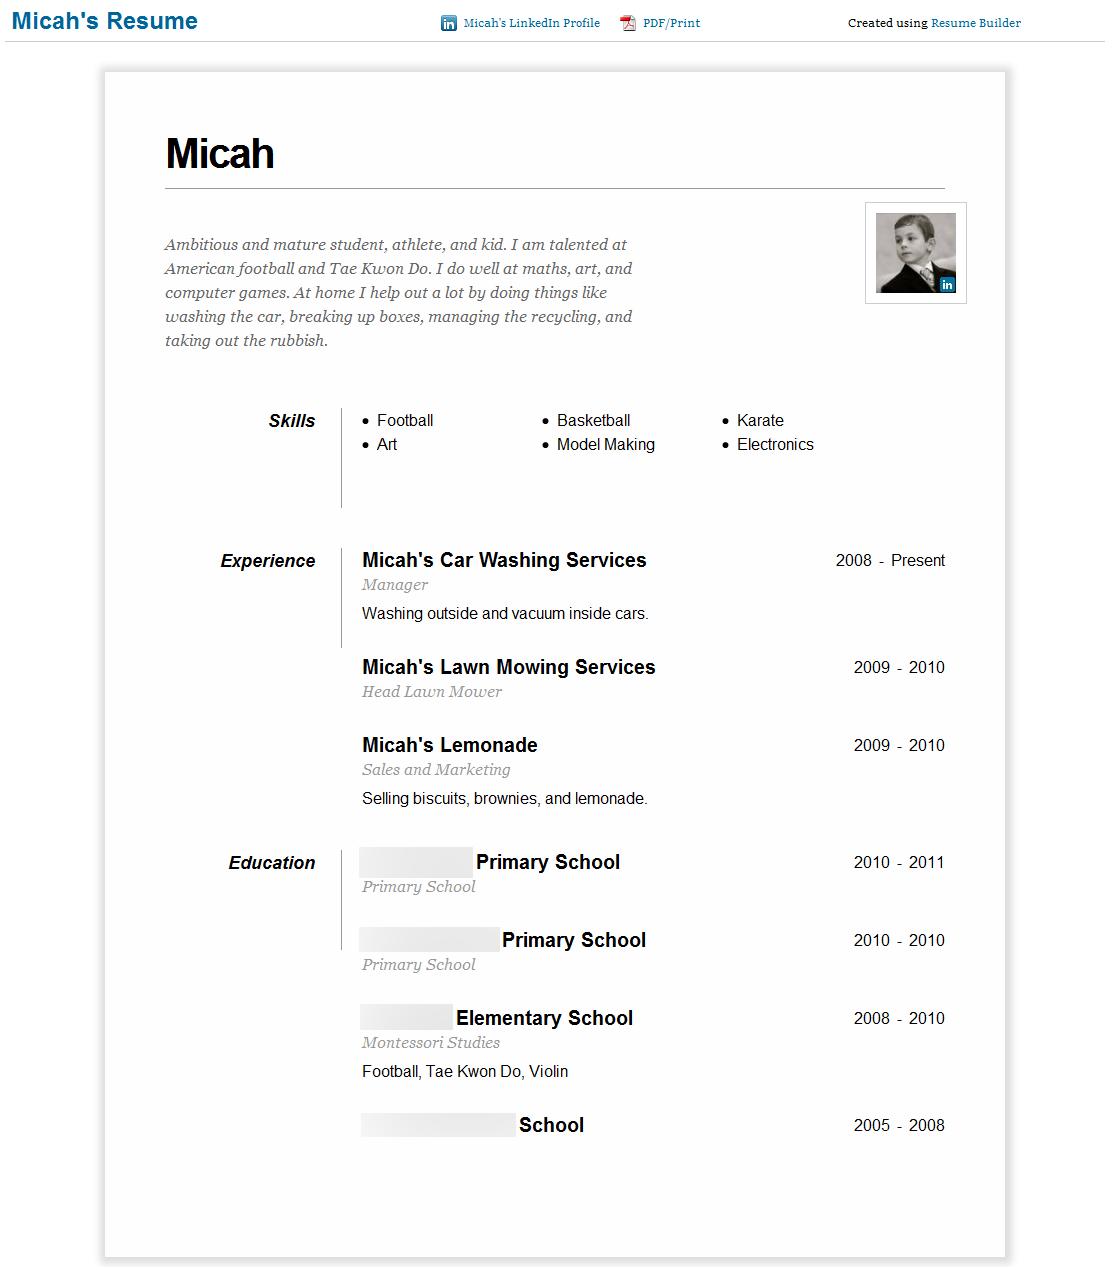 Download Resume Builder | Resume Templates and Resume Builder